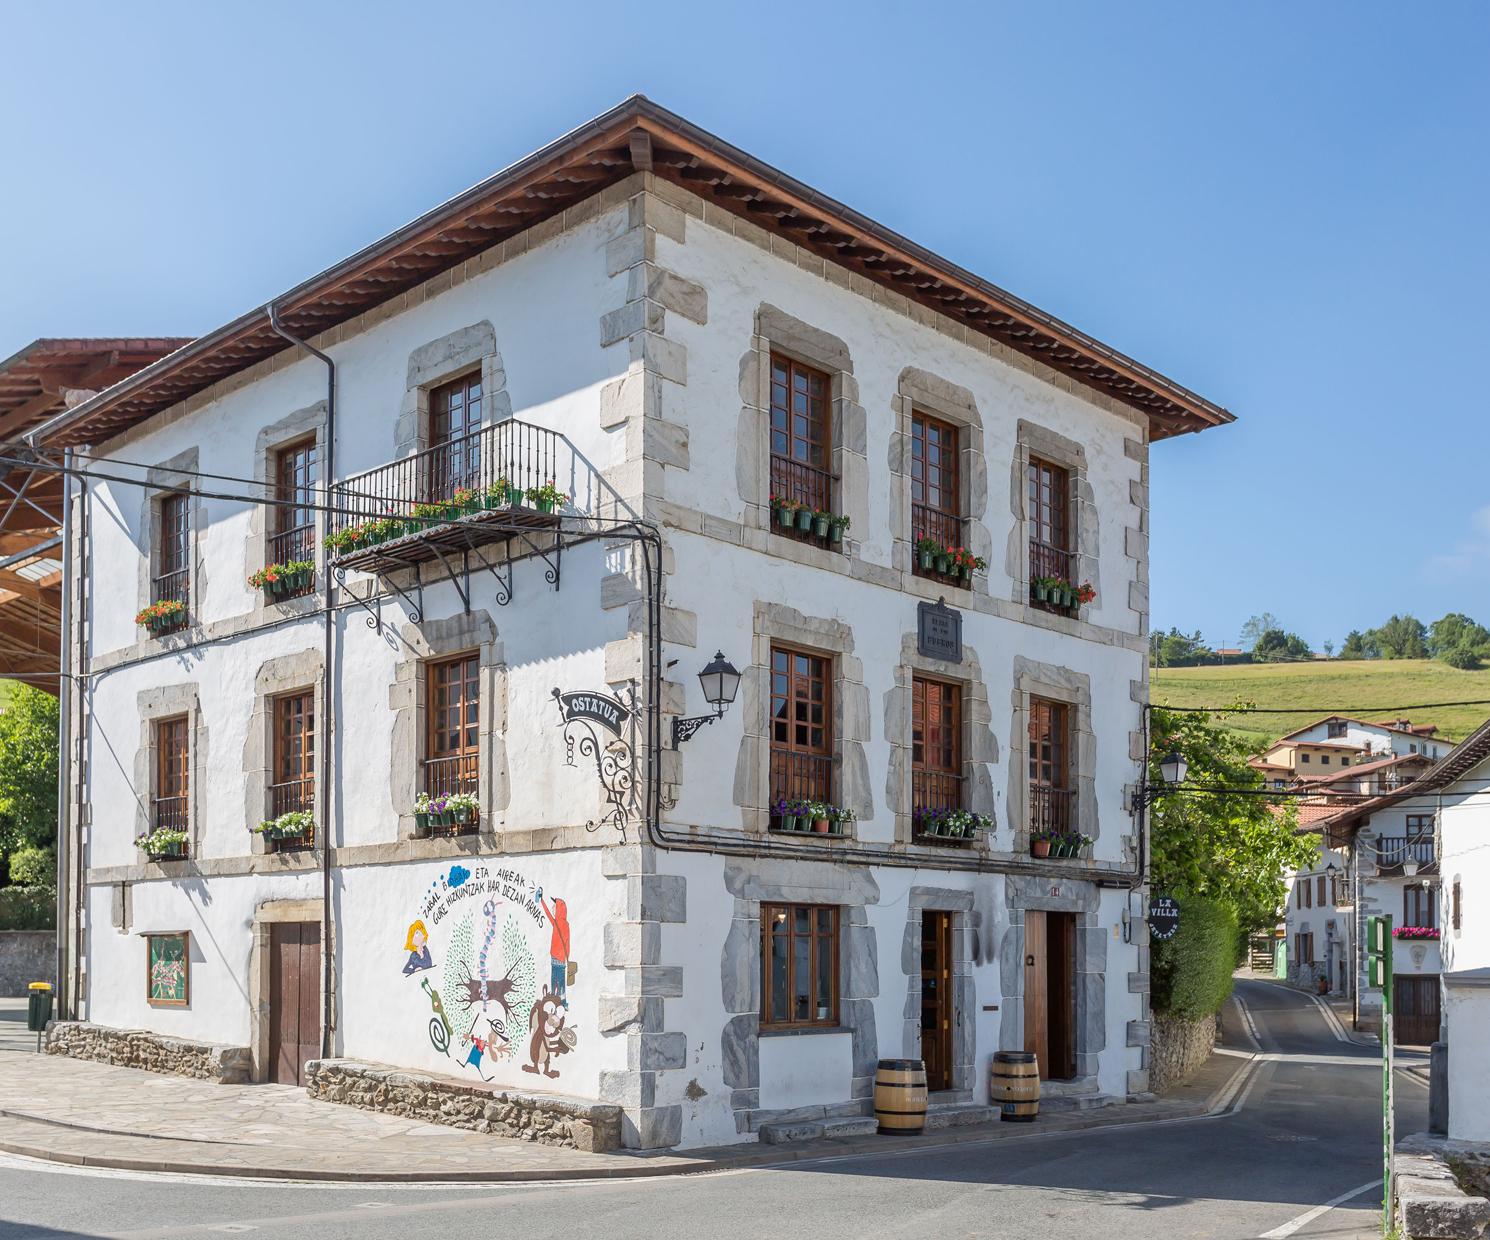 Restaurante de cocina tradicional en Navarra